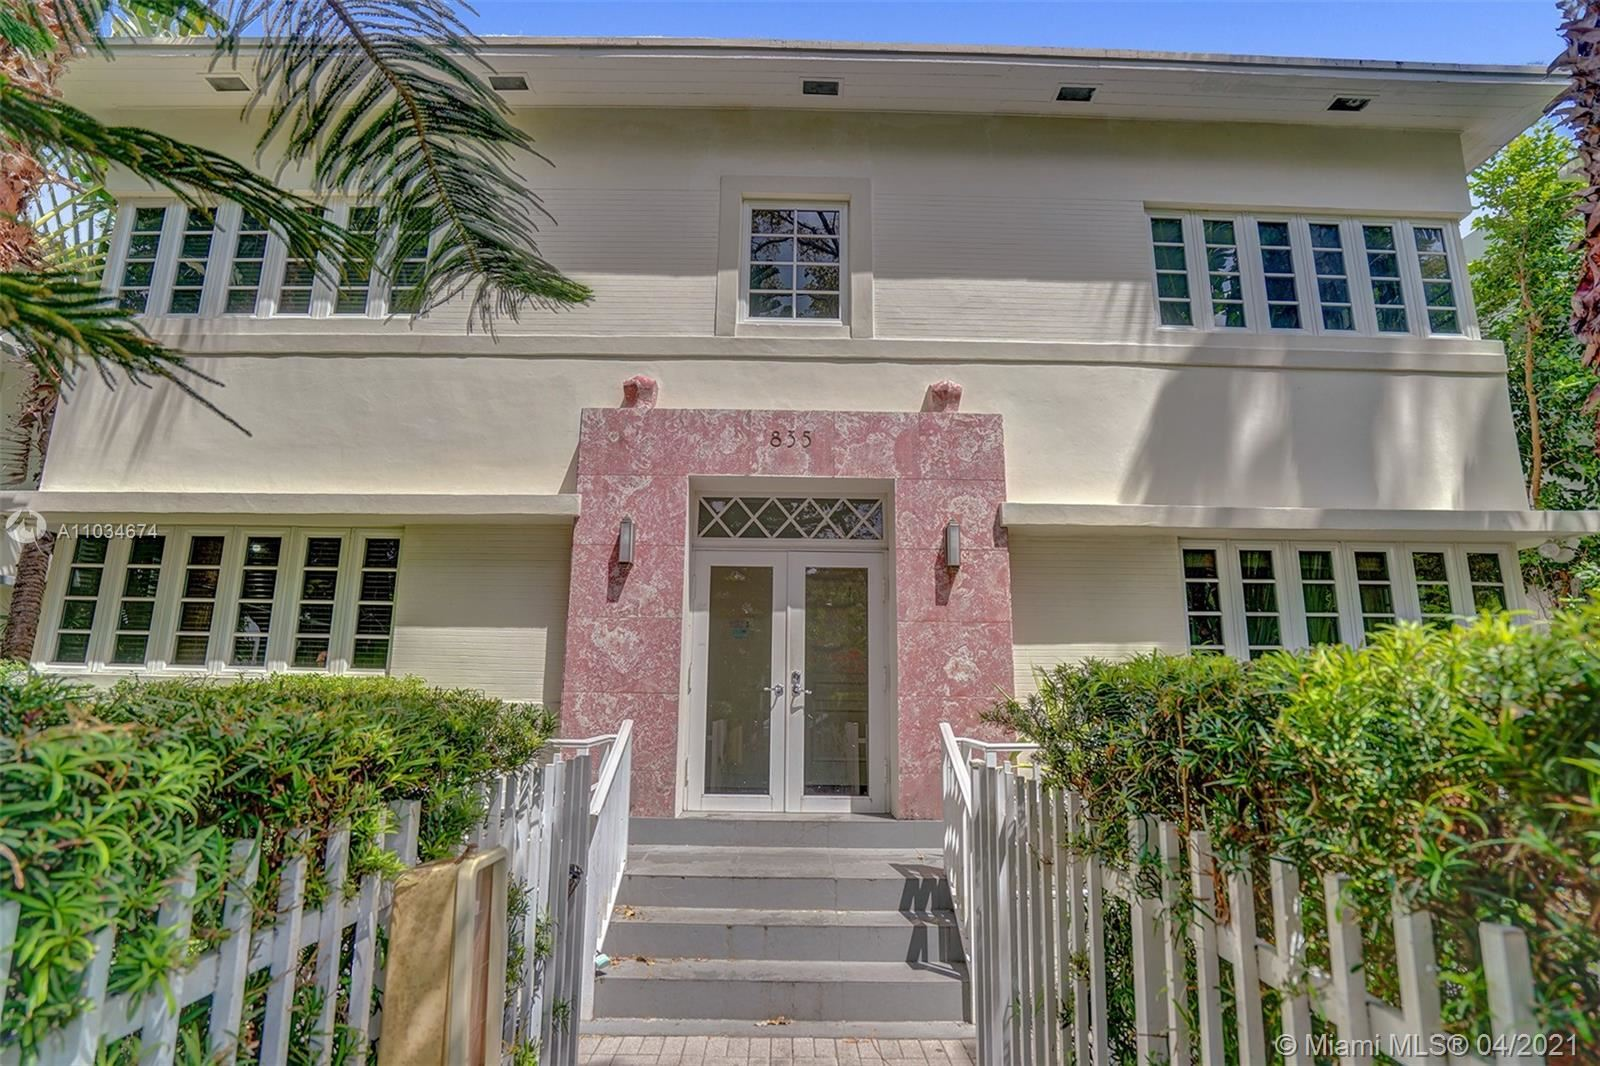 835 Michigan Ave, Miami Beach, FL 33139 - #: A11034674